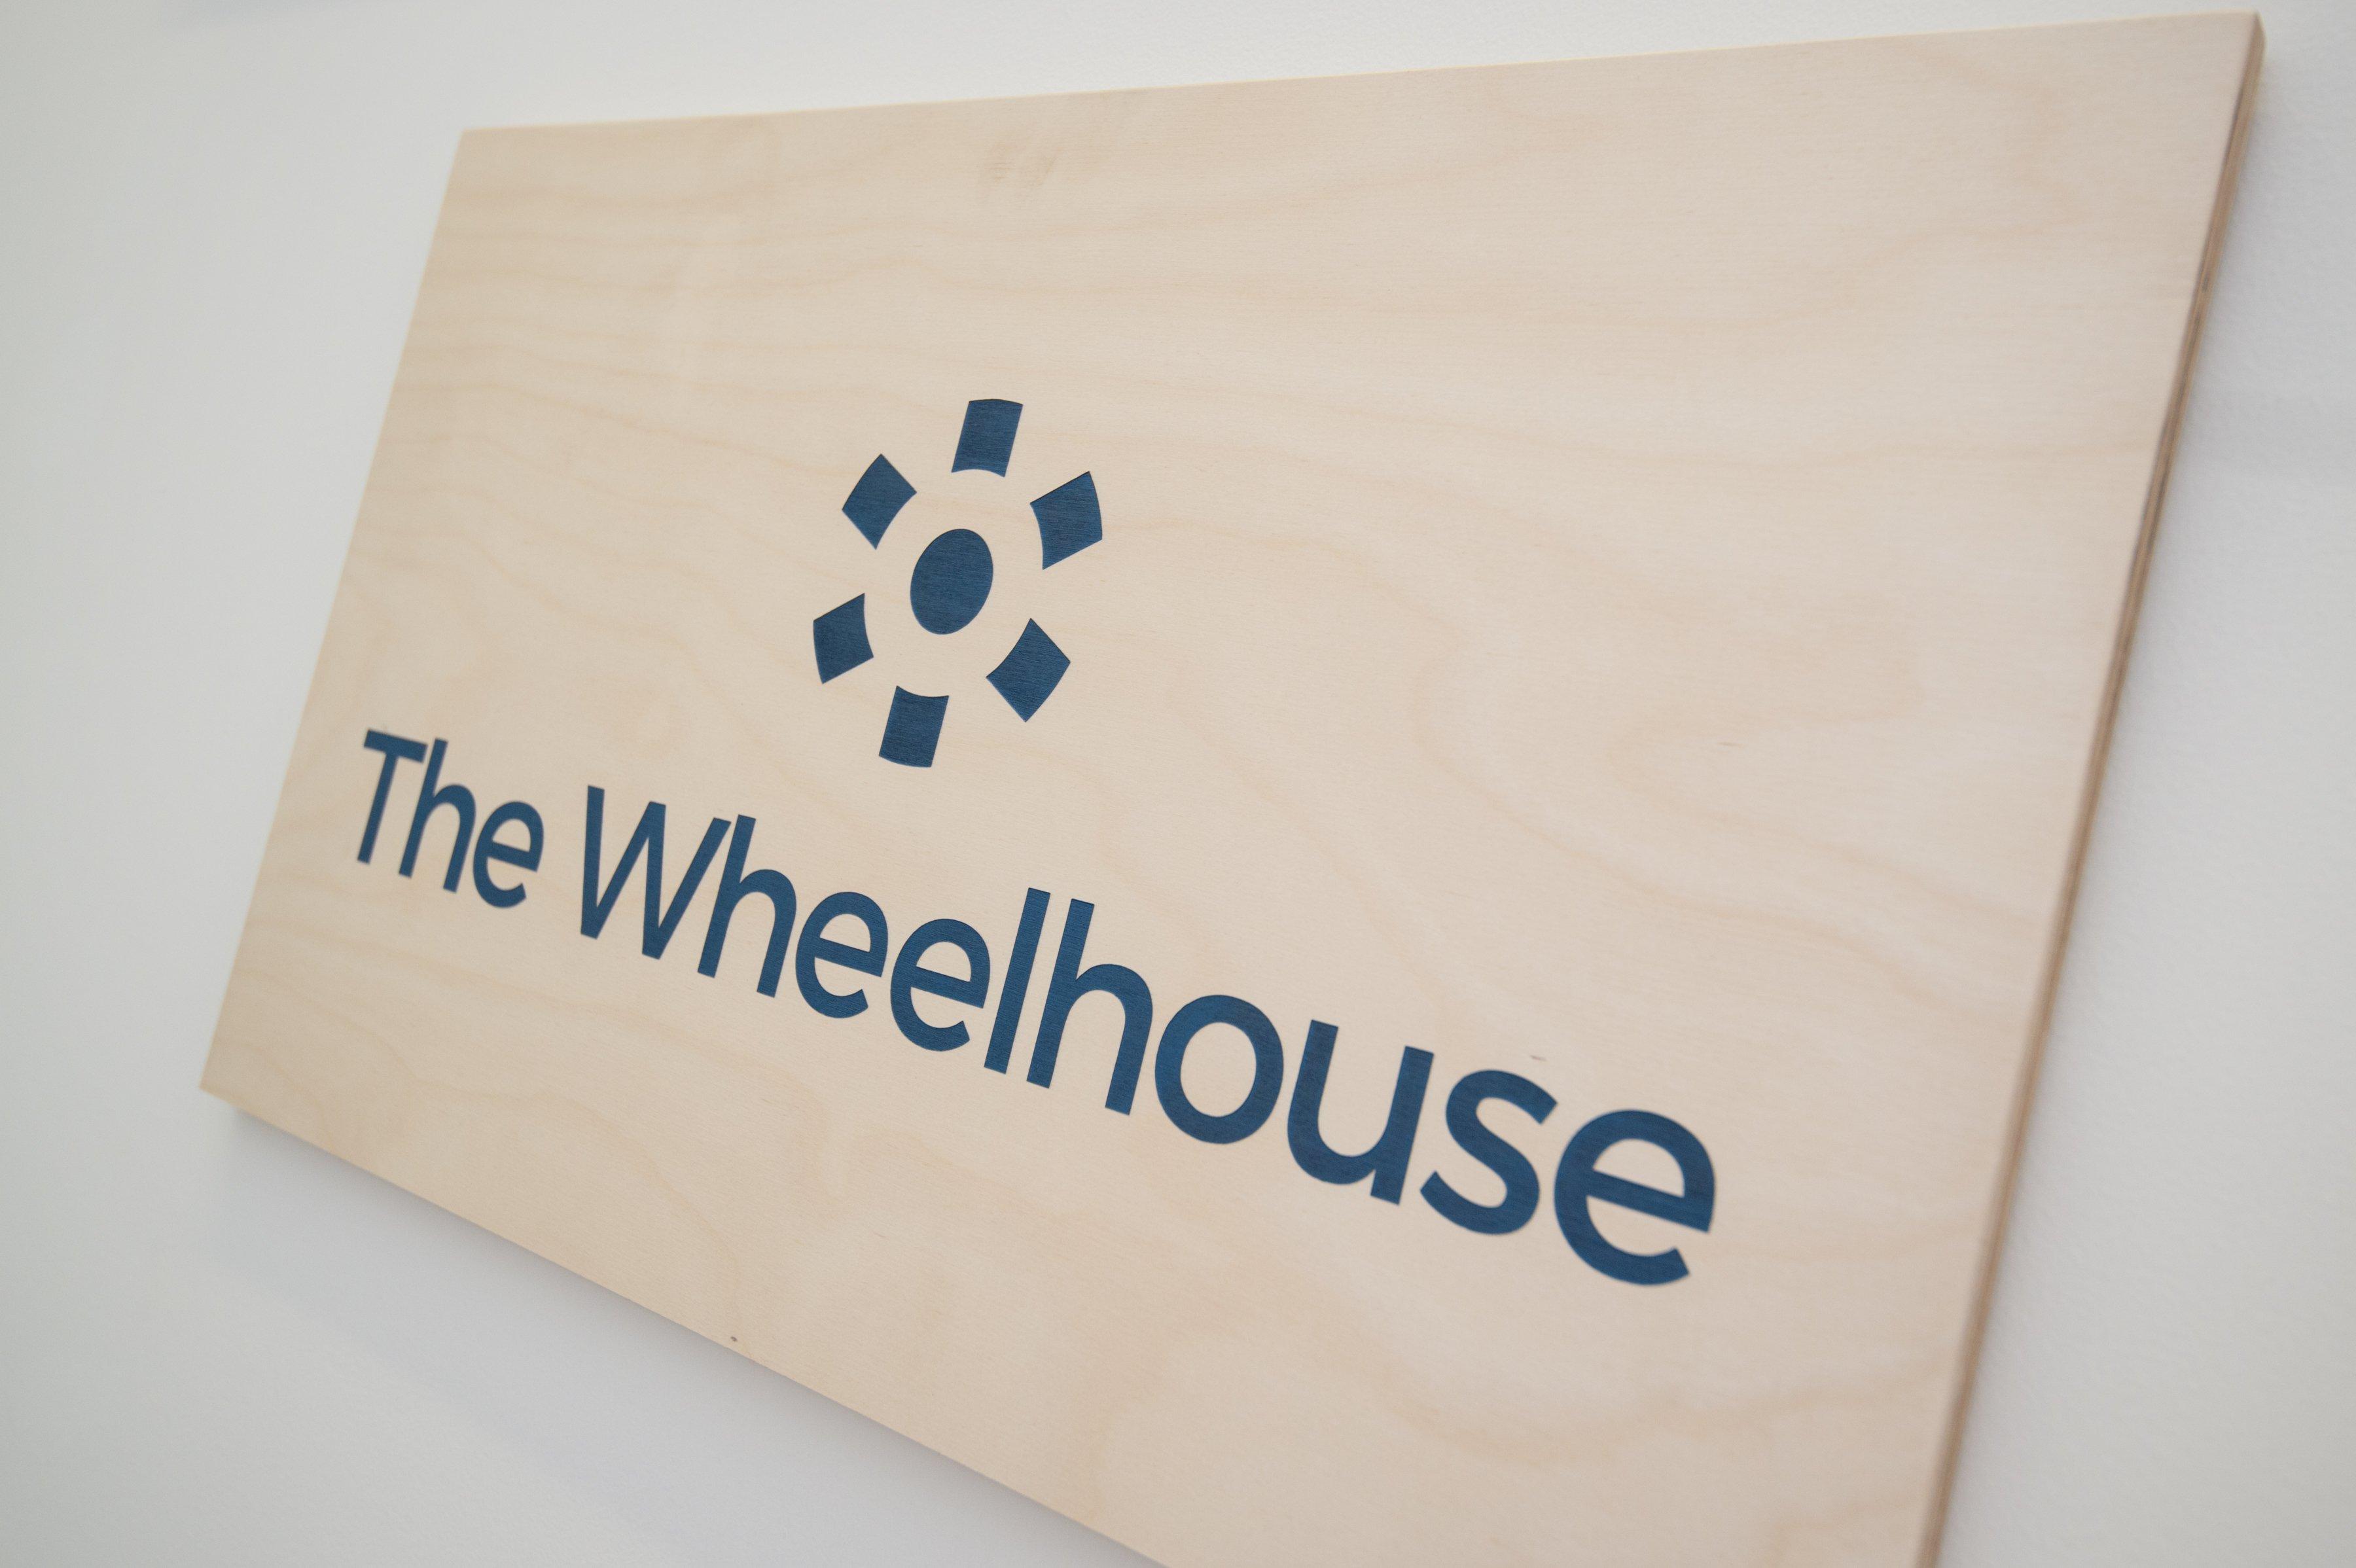 Welcome To The Wheelhouse